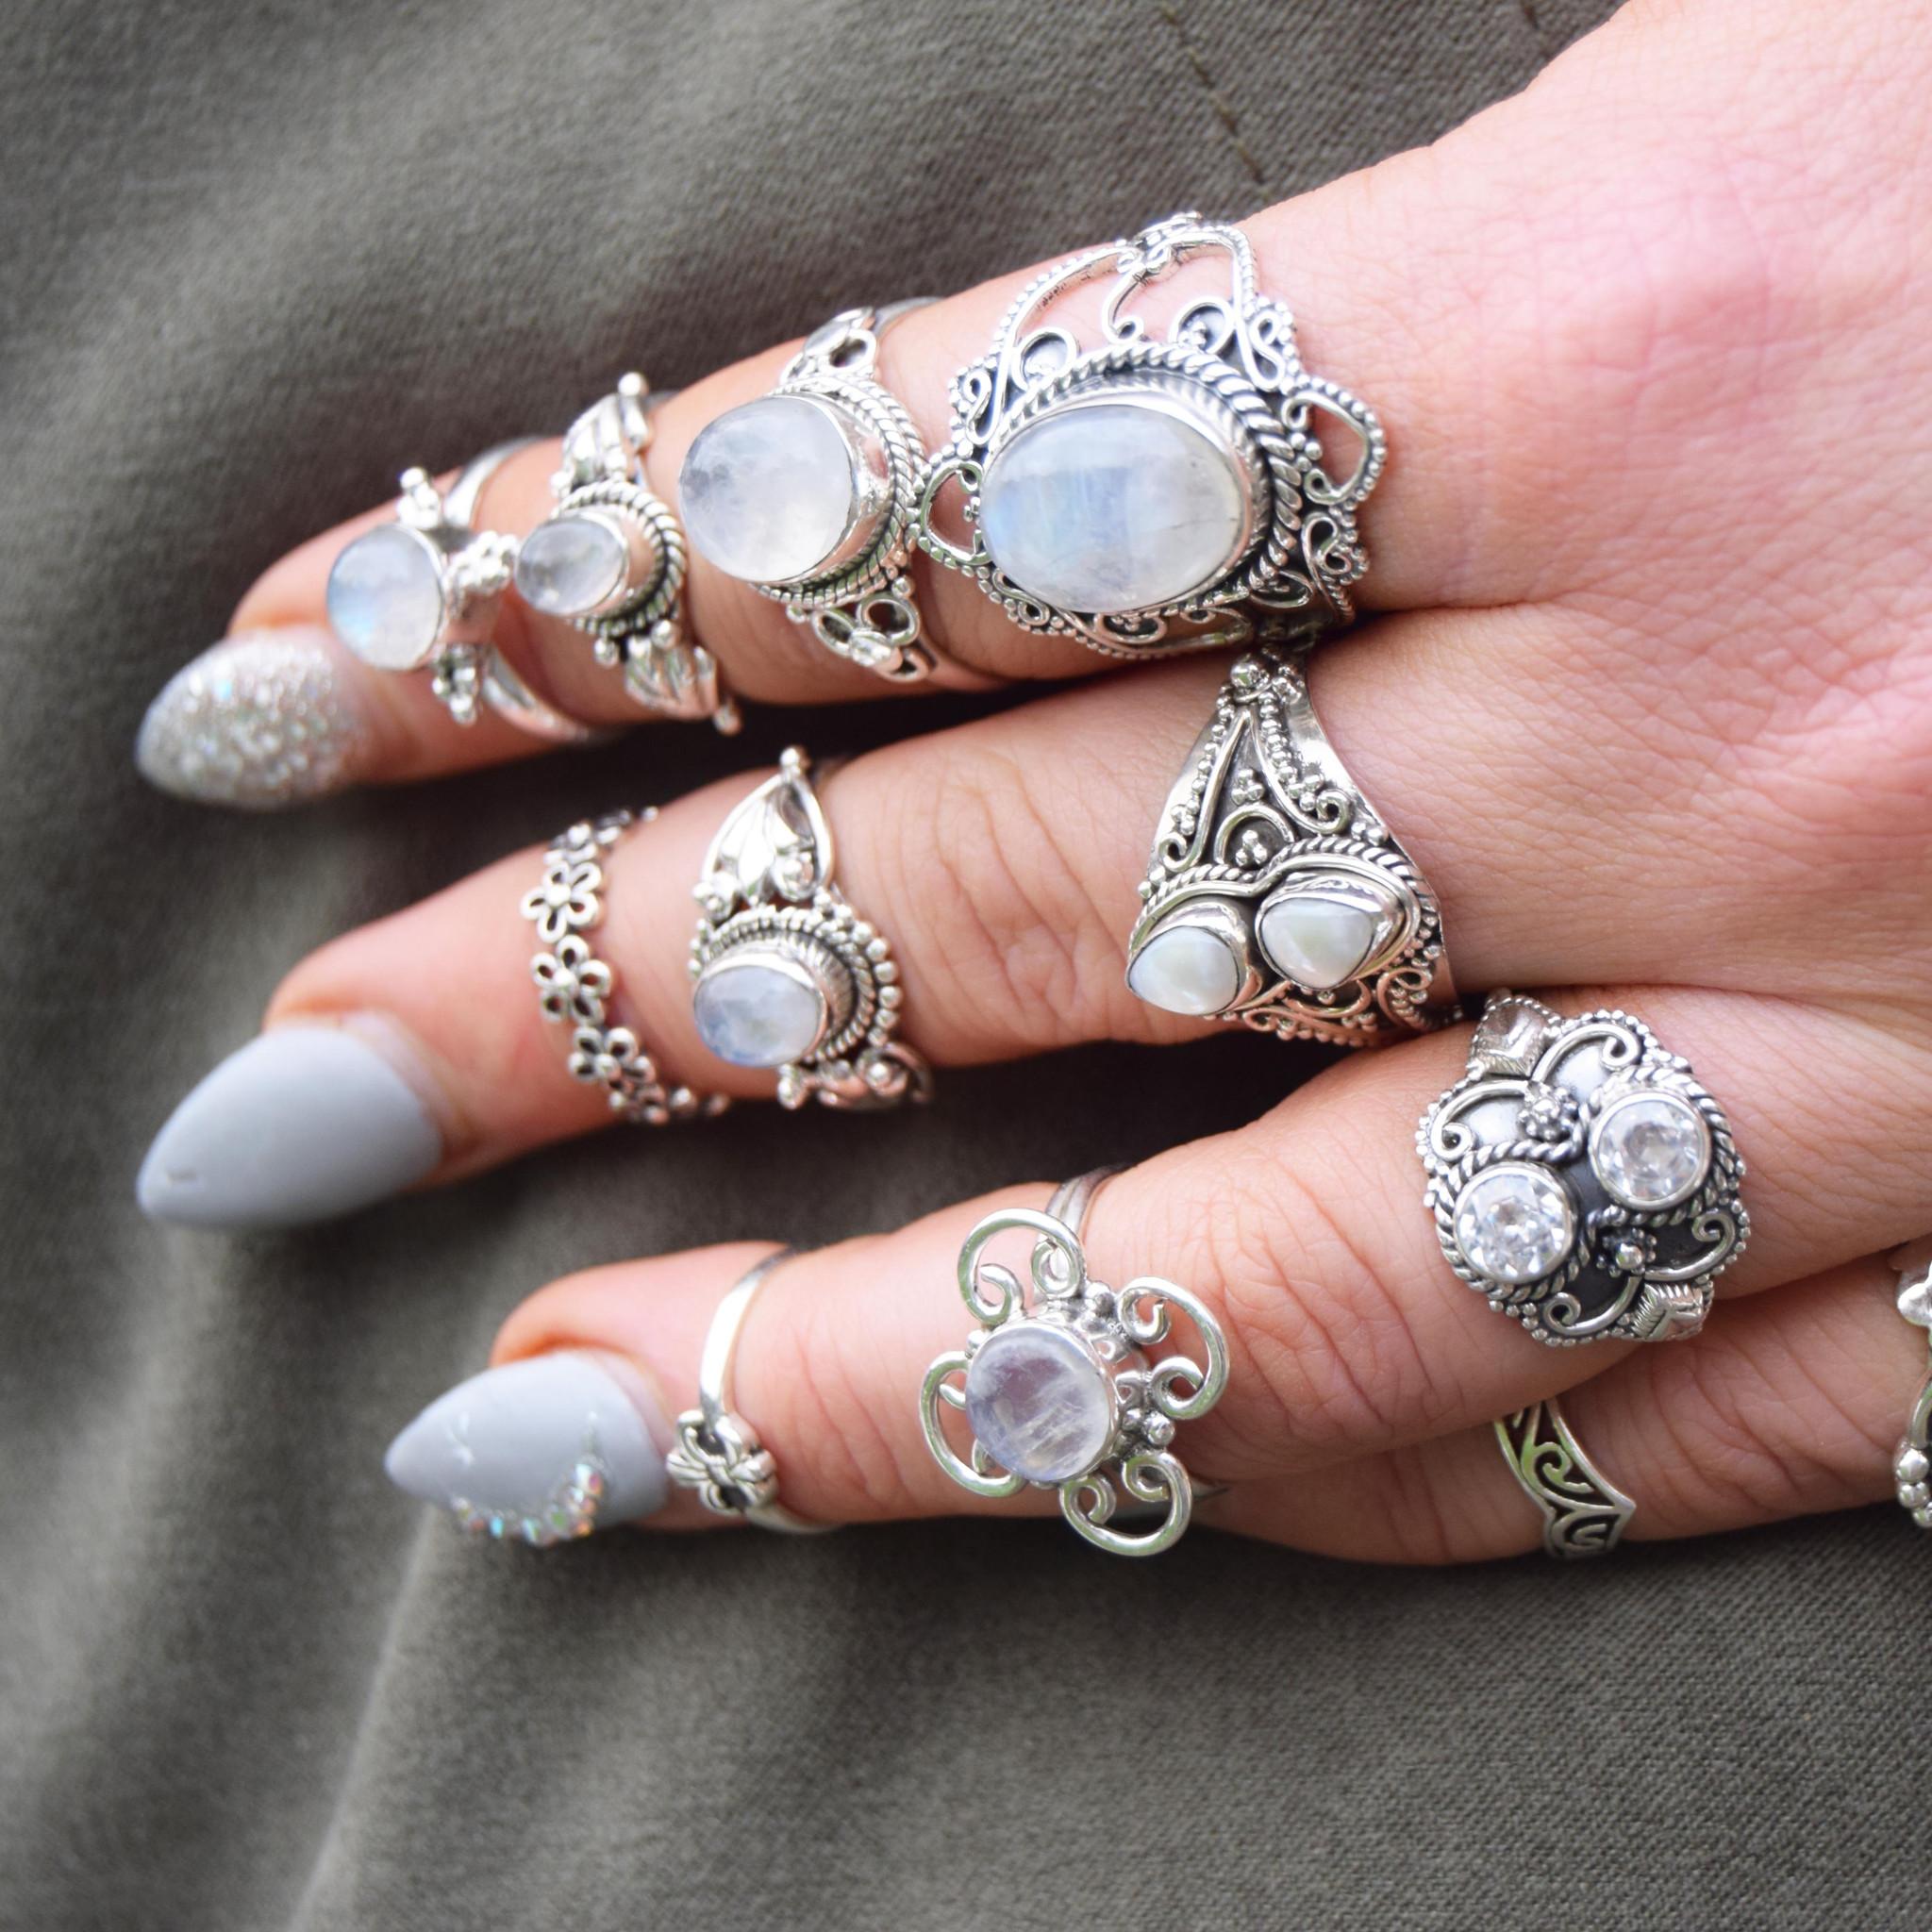 Silver boho rings